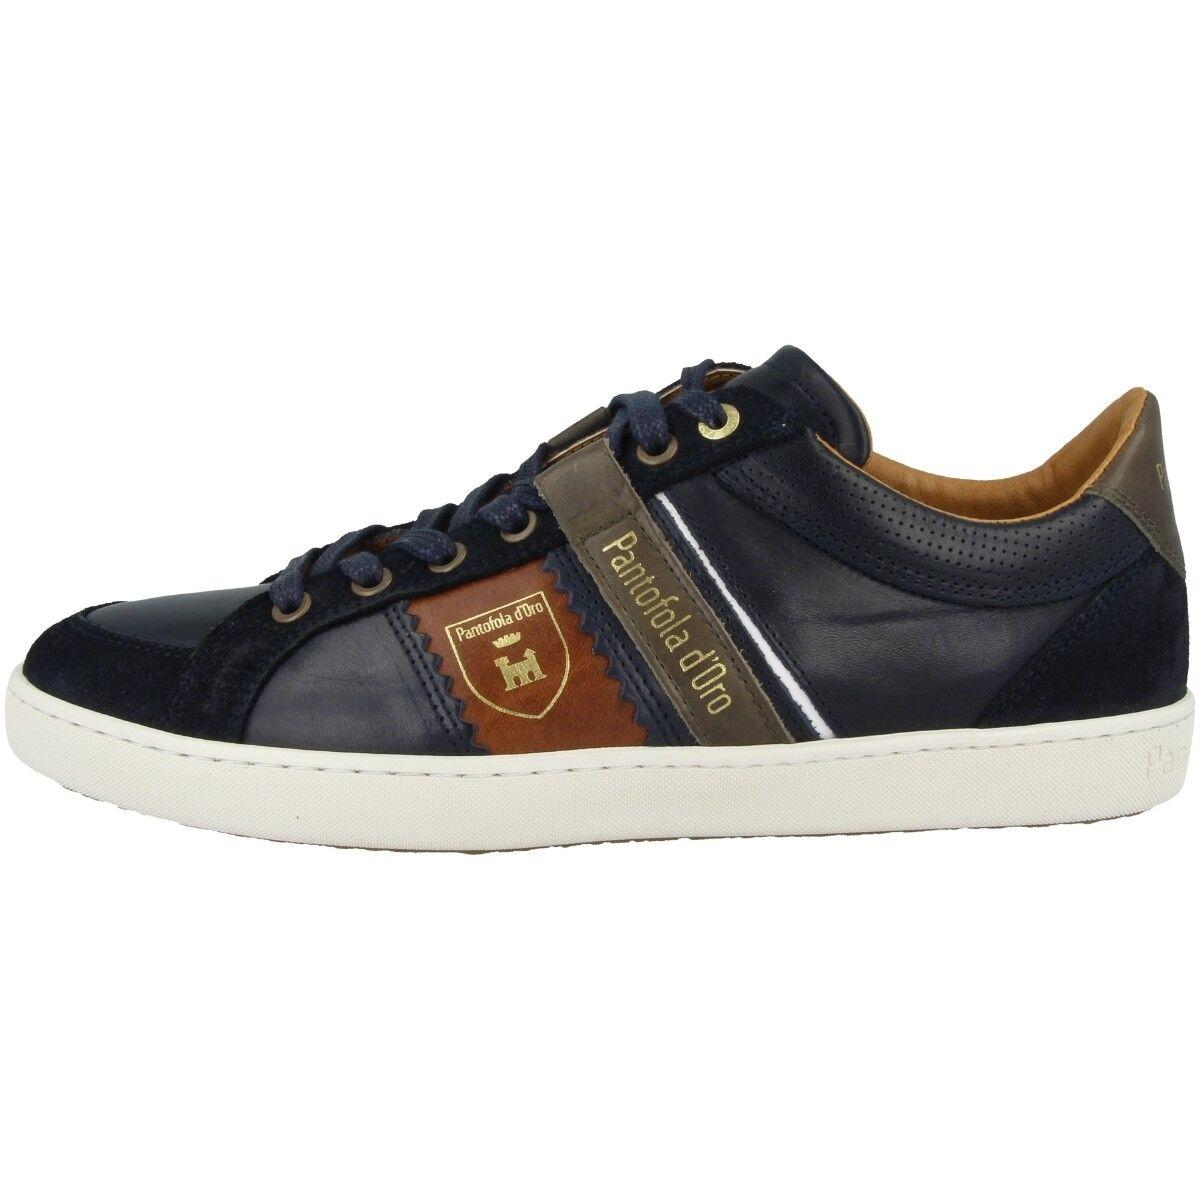 Pantofola D oro Savio Uomo Low Pesaro Piceno Scarpe scarpe da ginnastica blus 10191040.2